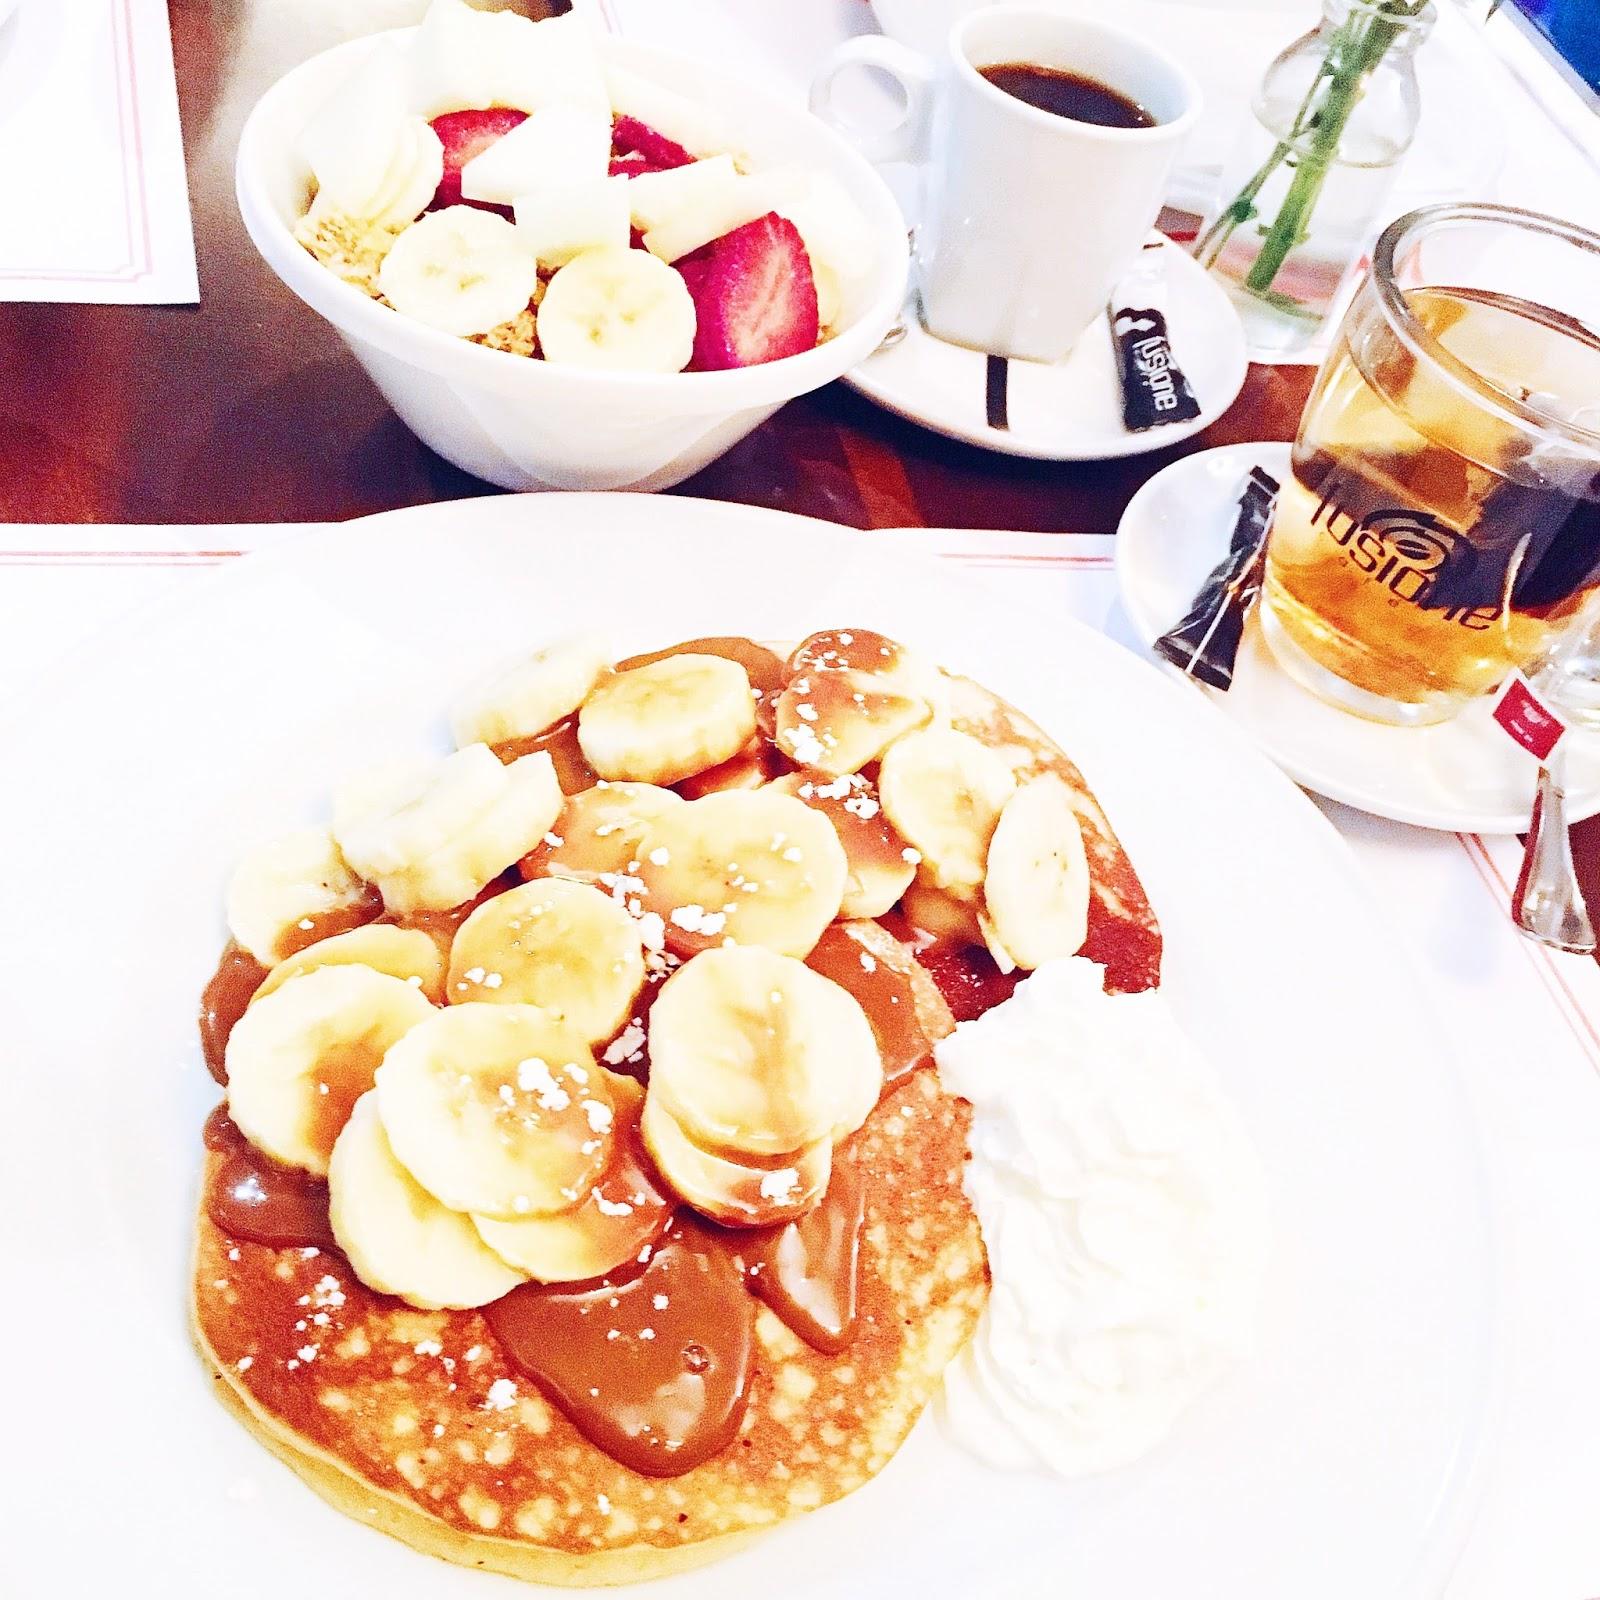 Barcelone brunch pancakes